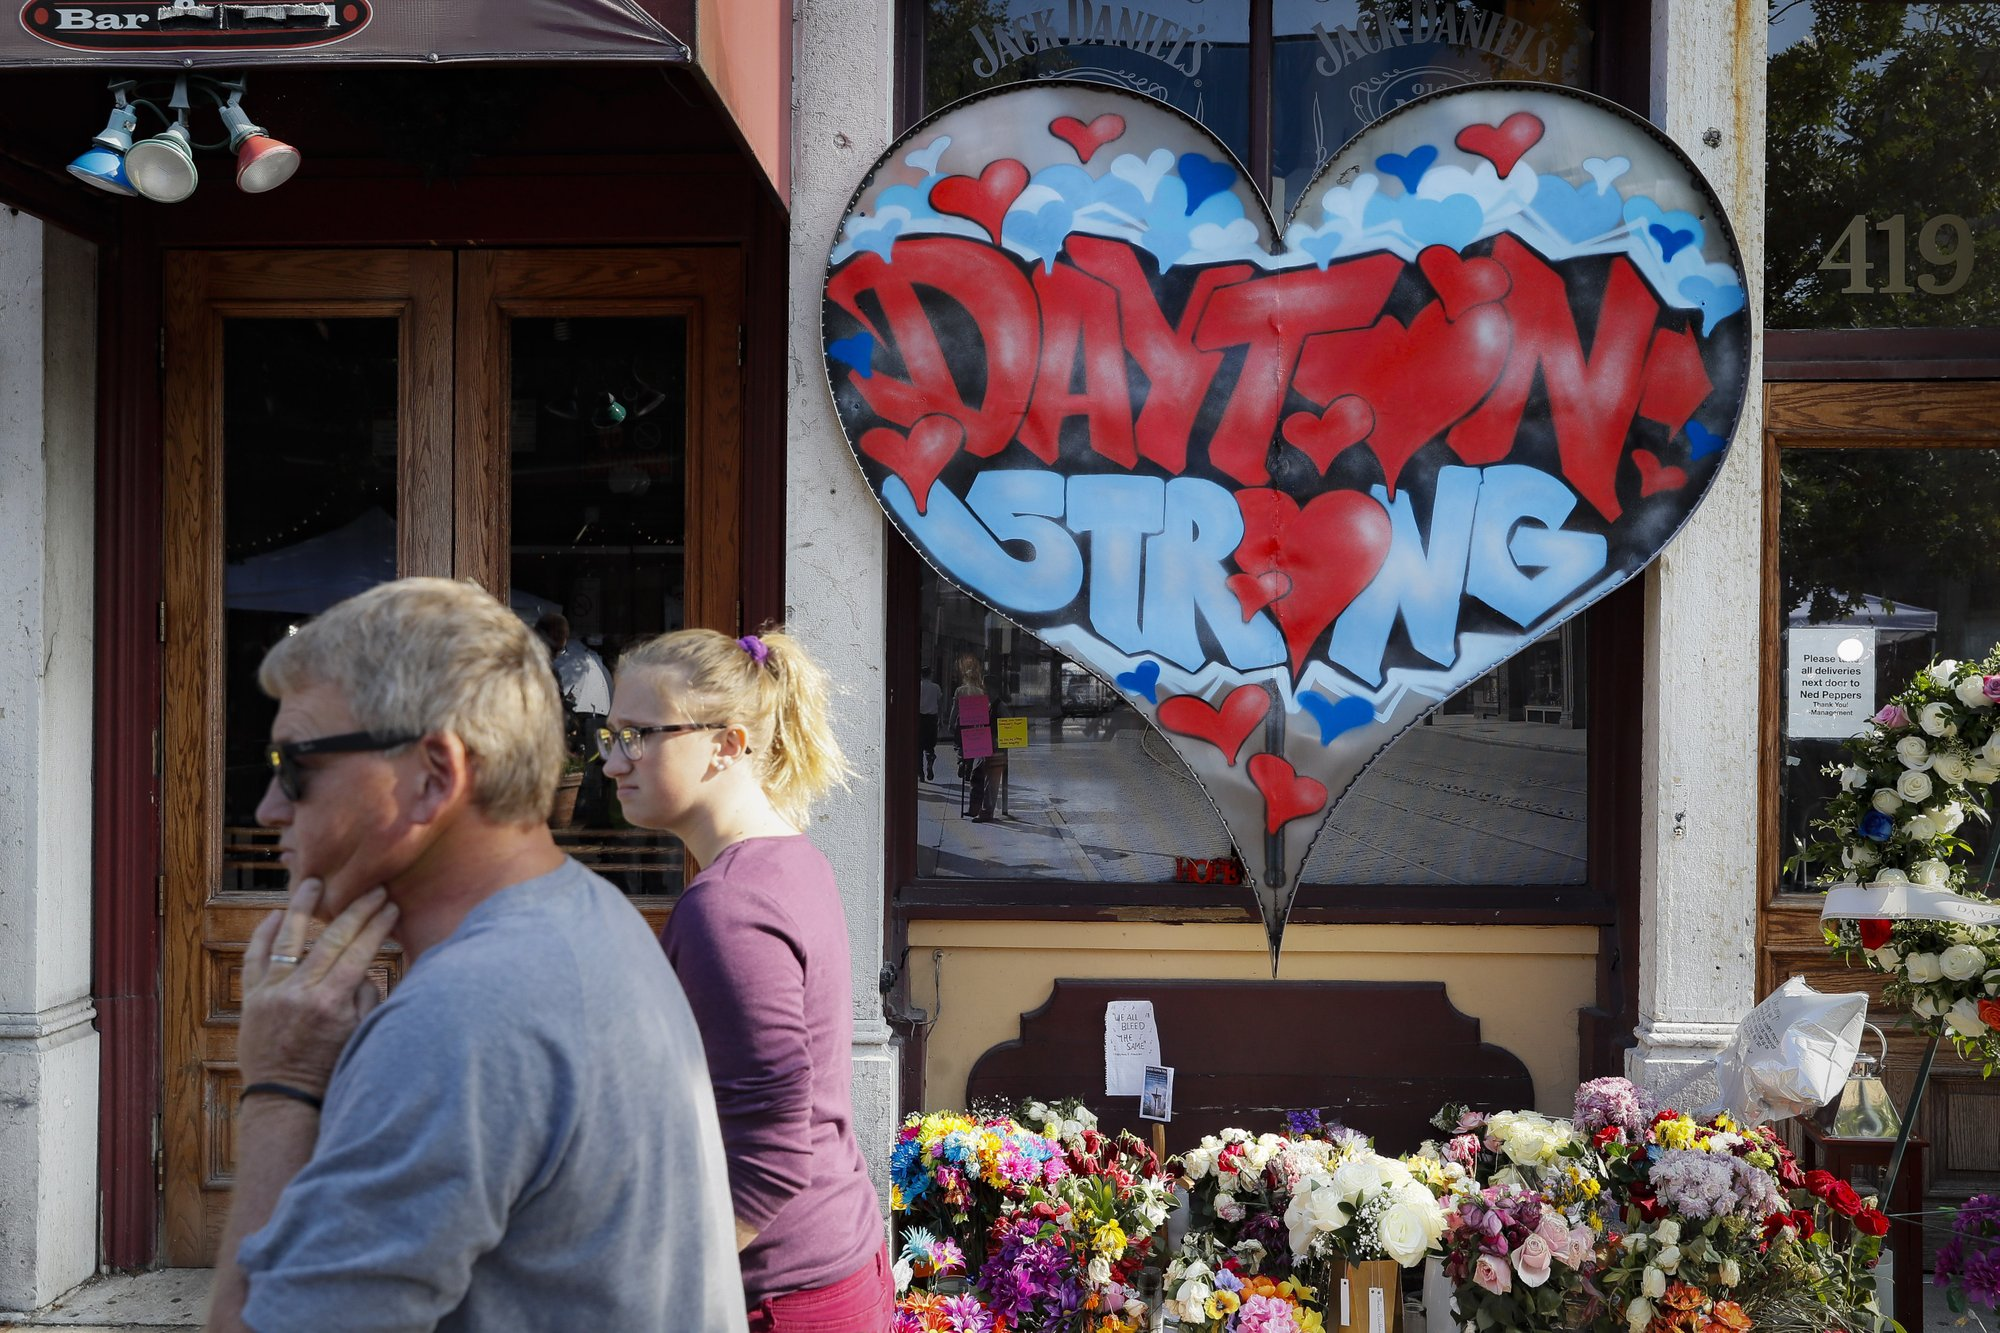 Court rejects news media bid for gunman's school records